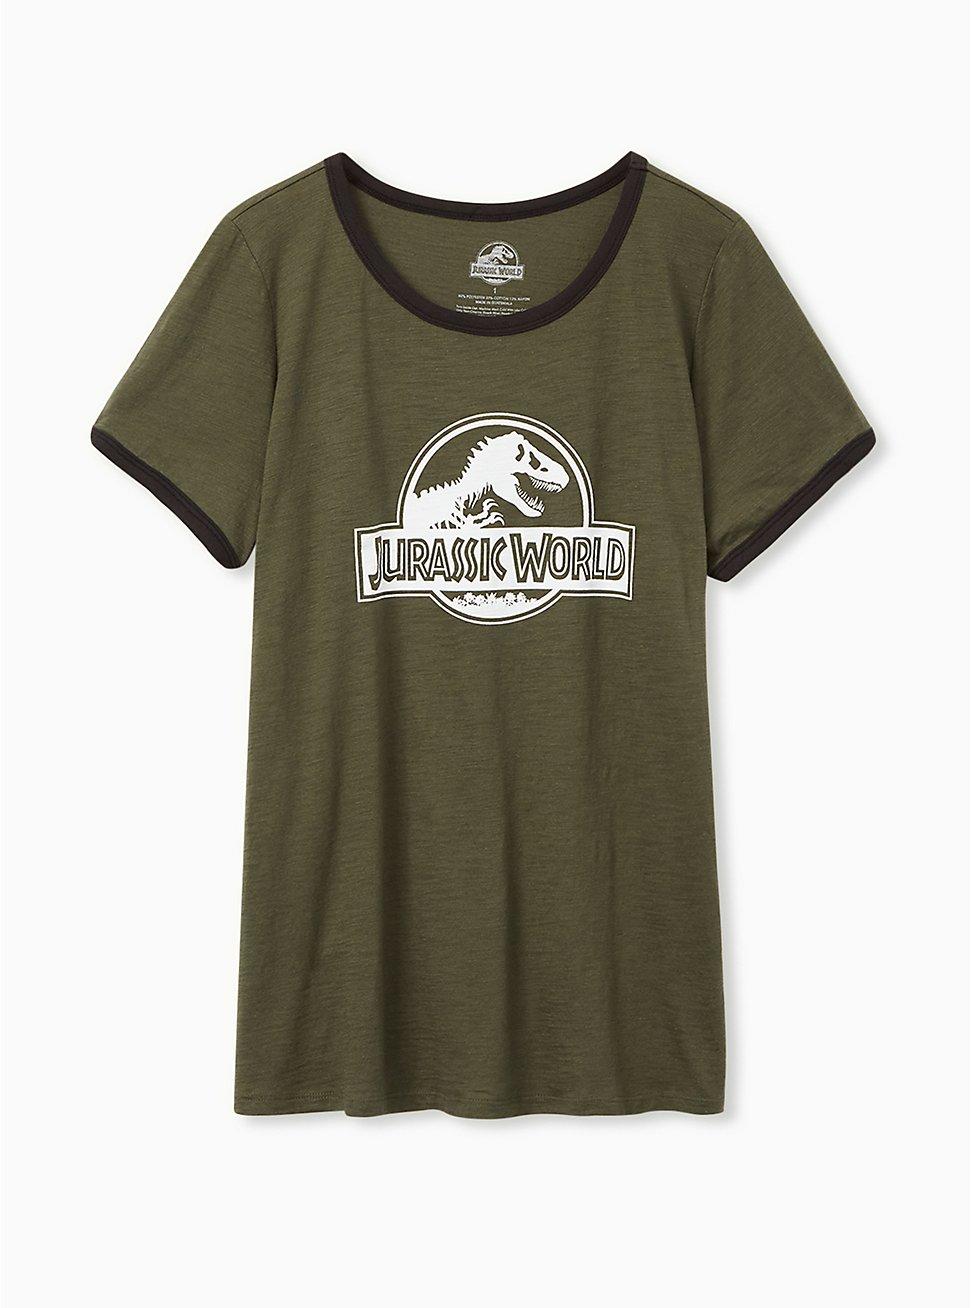 Jurassic Park Classic Fit Ringer Tee - Olive Green, CHARCOAL, hi-res